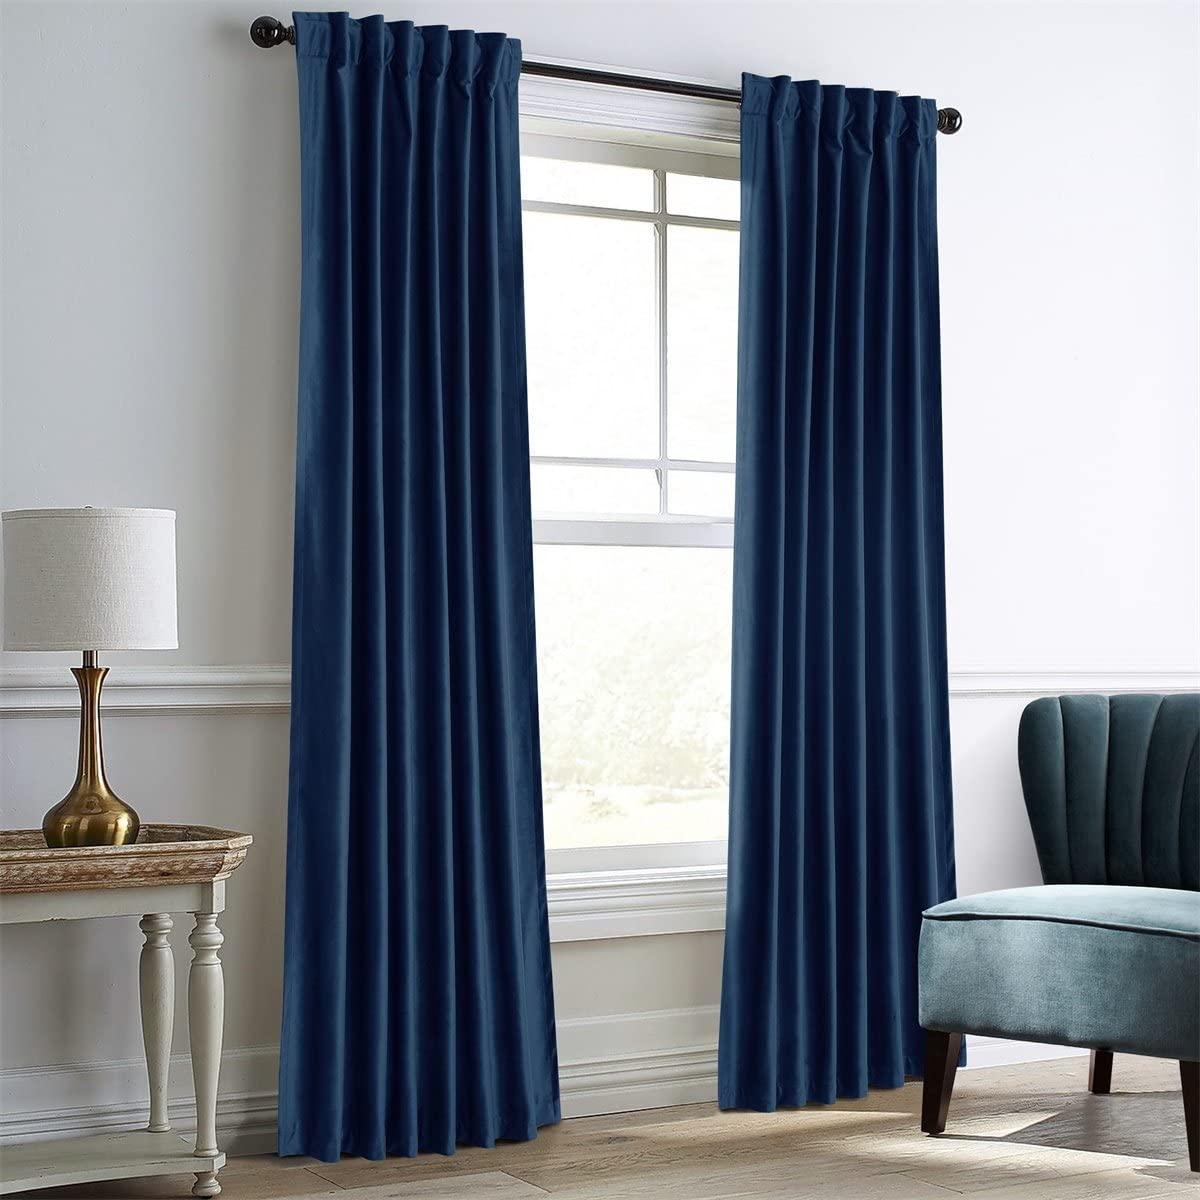 Dreaming Casa Royal Blue Velvet Room Darkening Curtains for Living Room Thermal Insulated Rod Pocket Back Tab Window Curtain